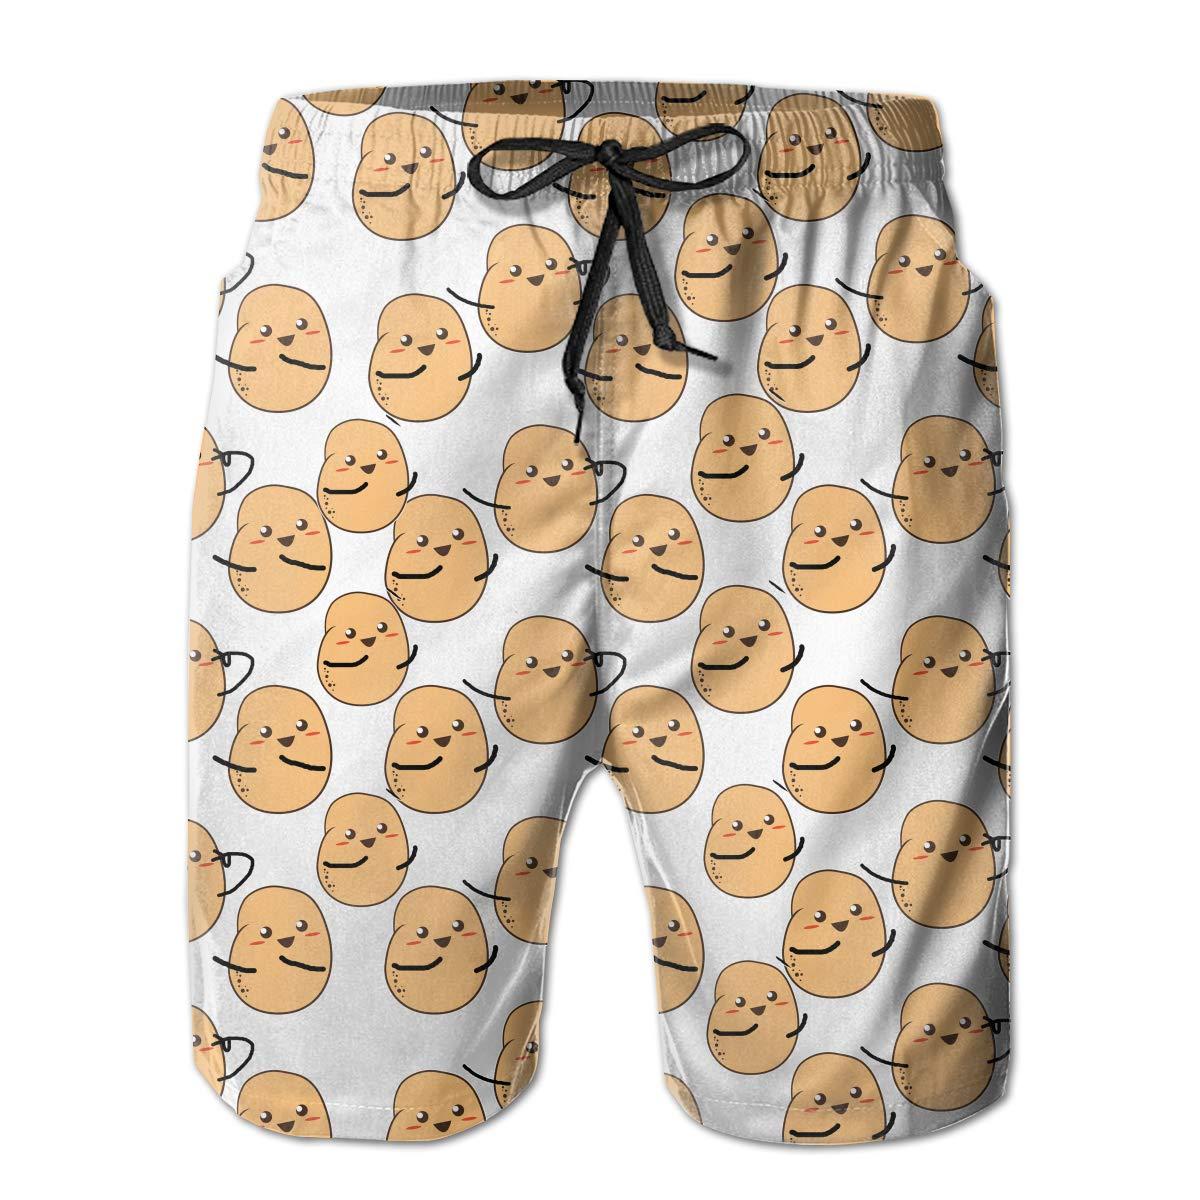 YongColer Boardshort Im A Potato Cute Potato Boys Teen Quick Dry Sports Trunks